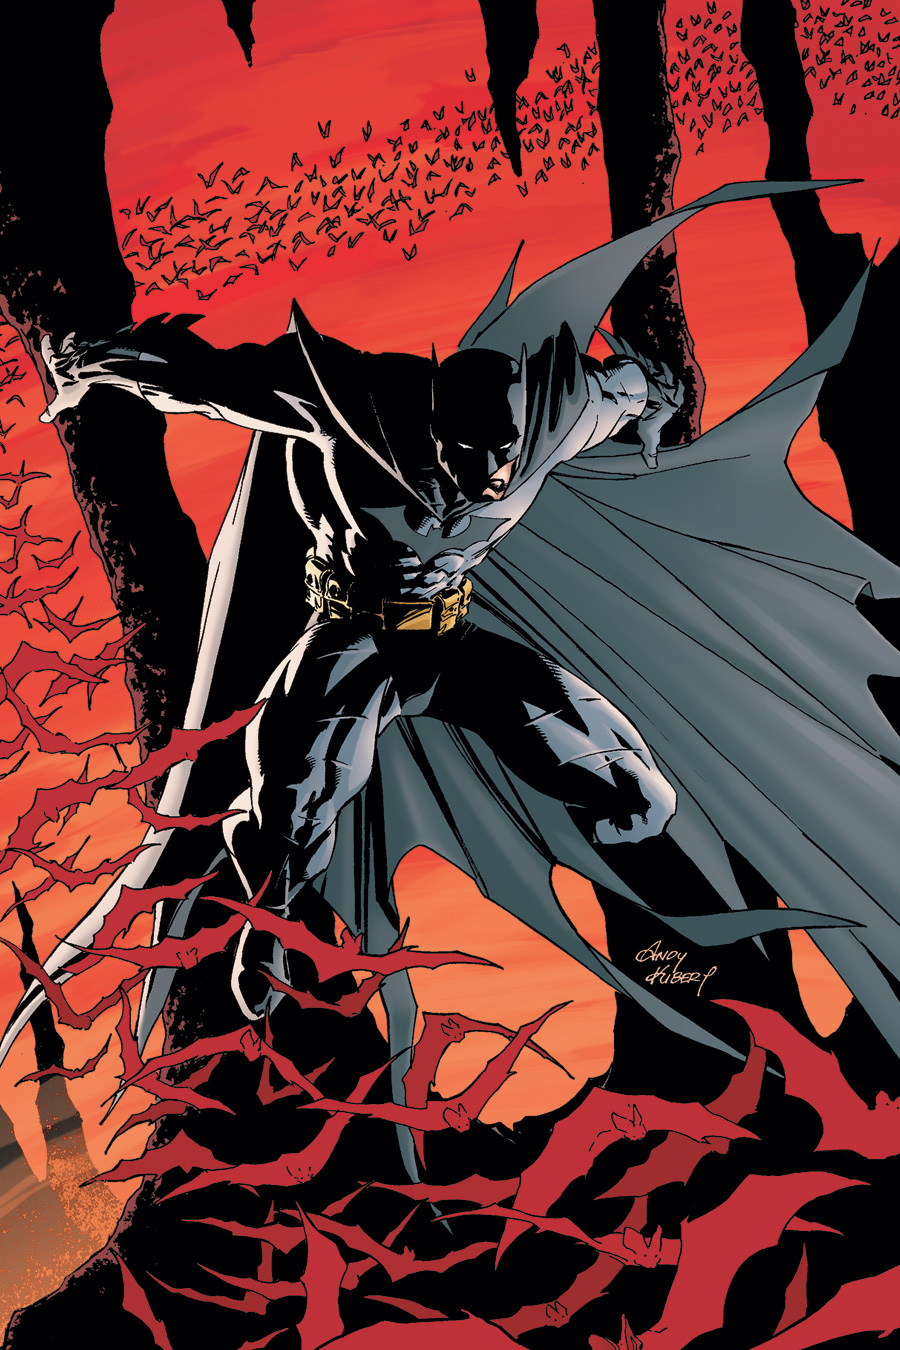 Batman vs The Black Glove